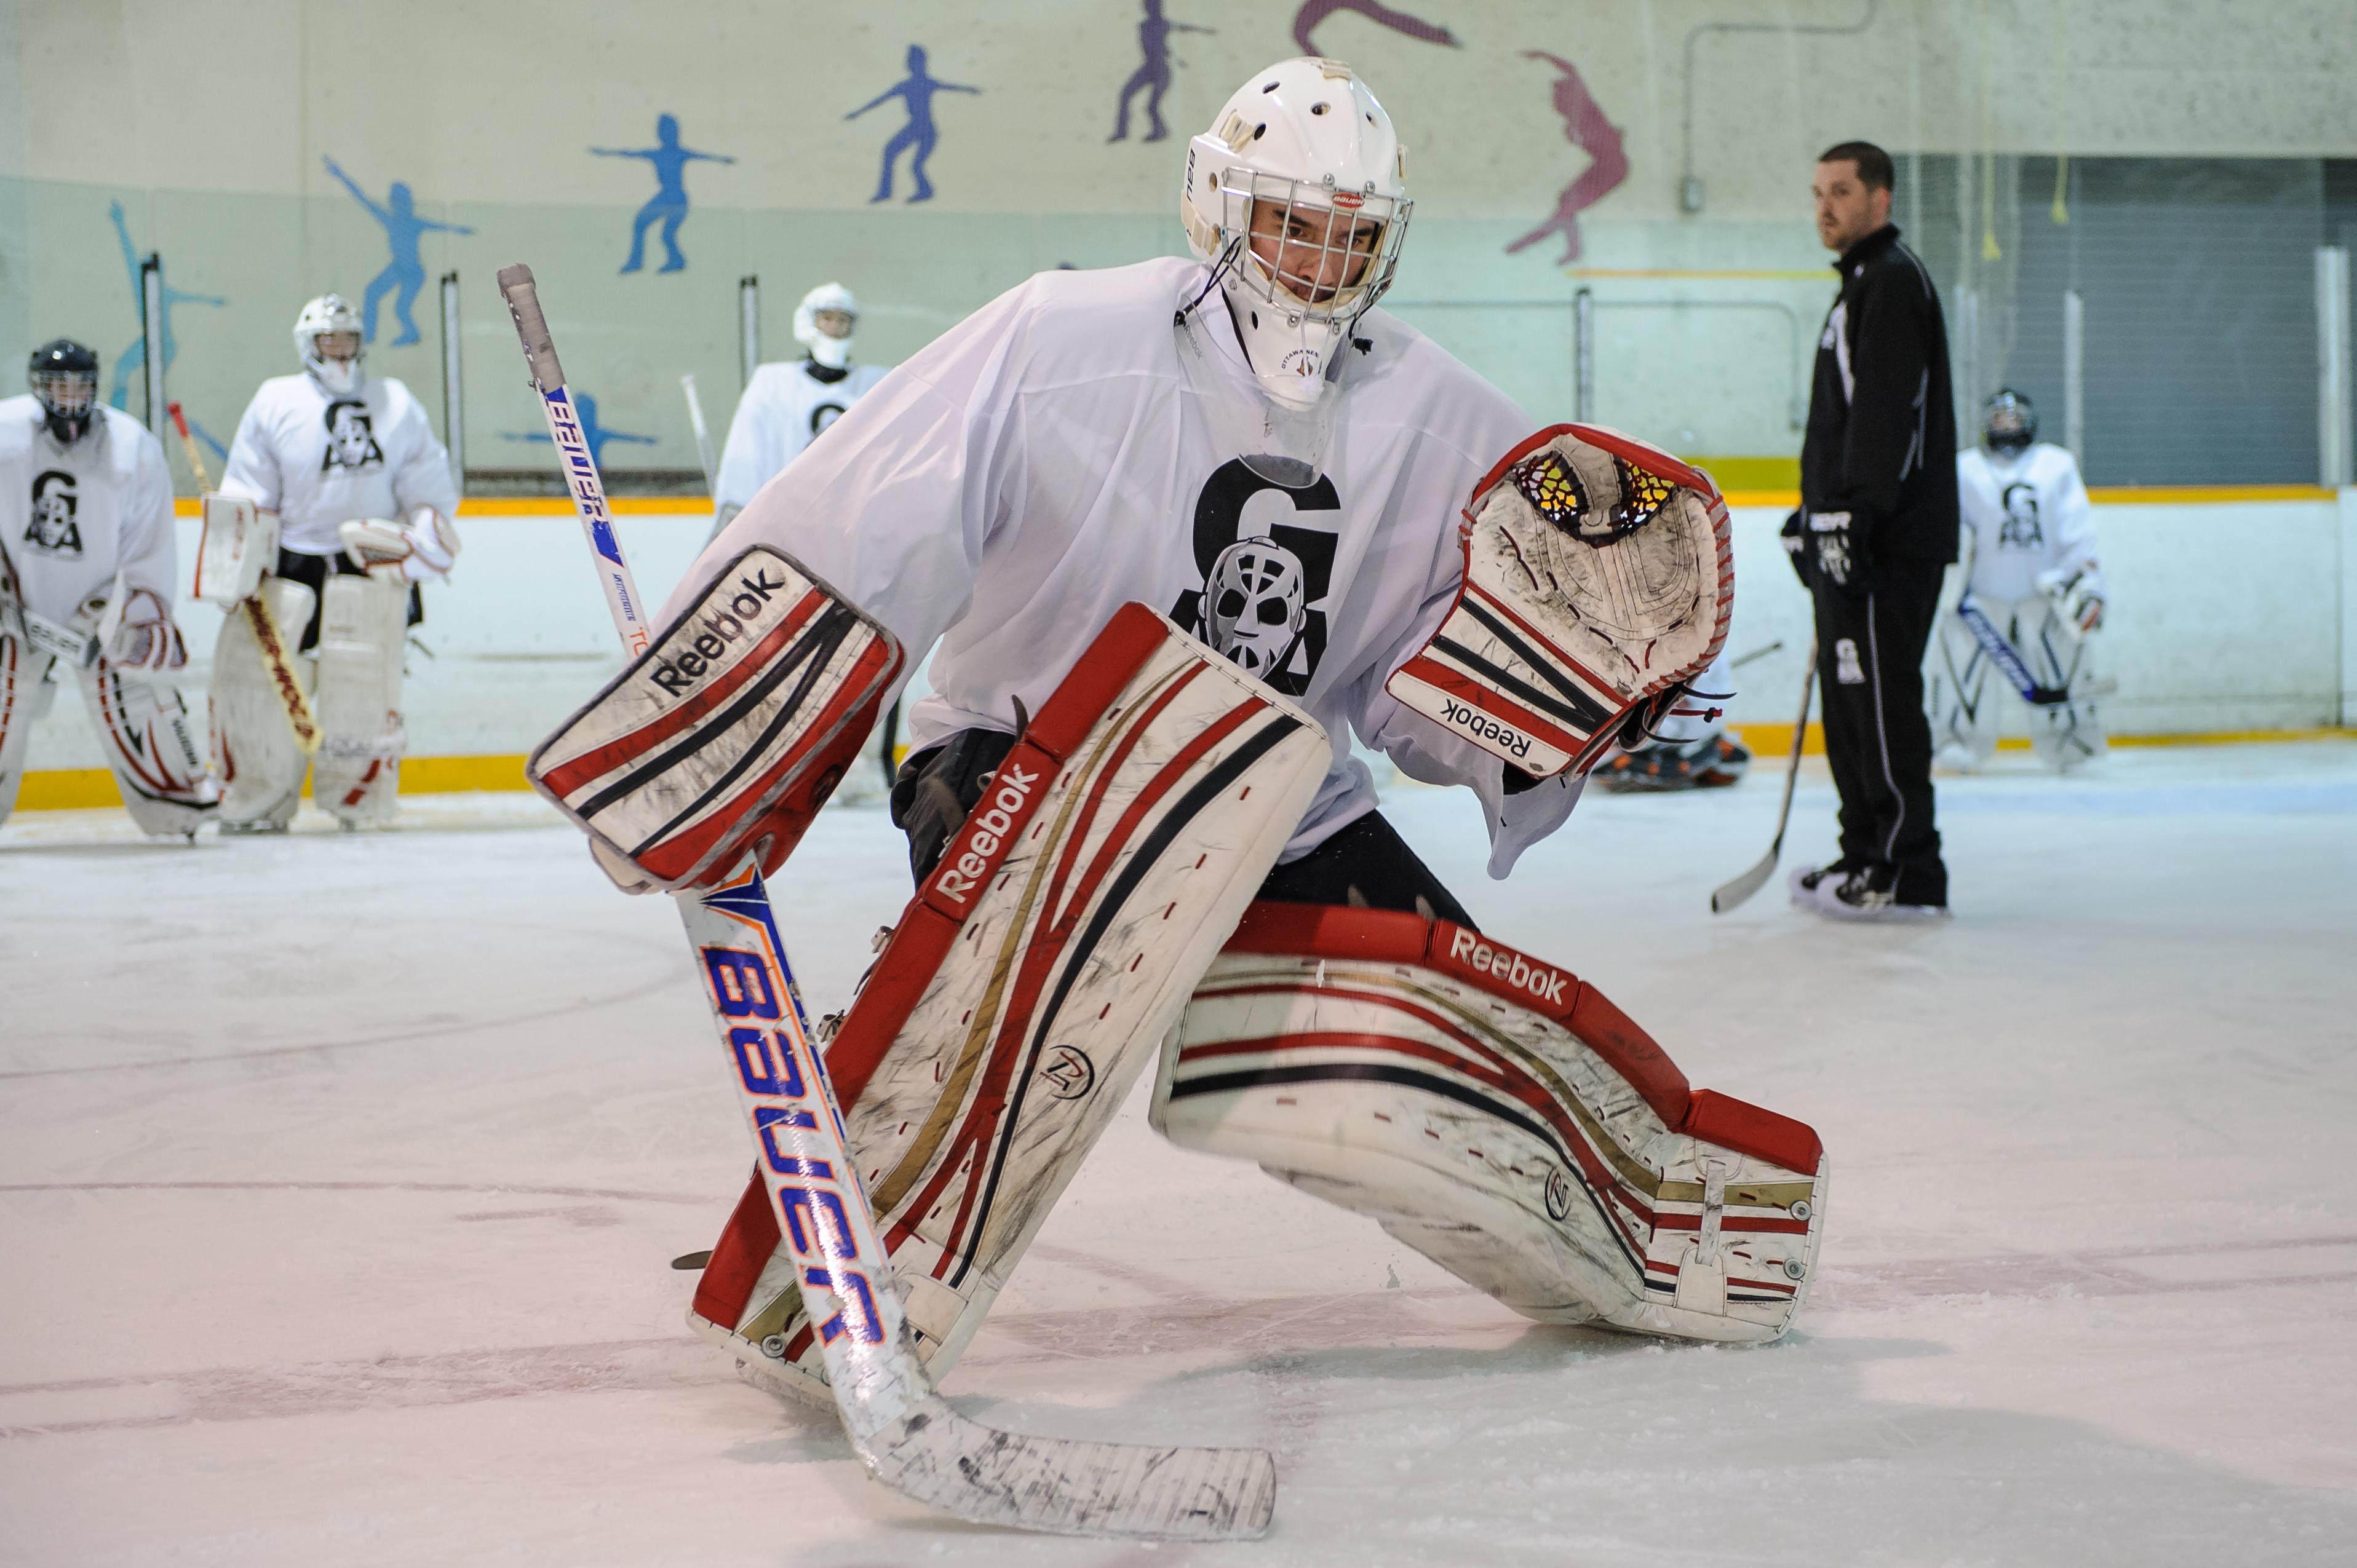 Pre Season Conditioning Camp Gaahockey Elite Ottawa Goalie Training